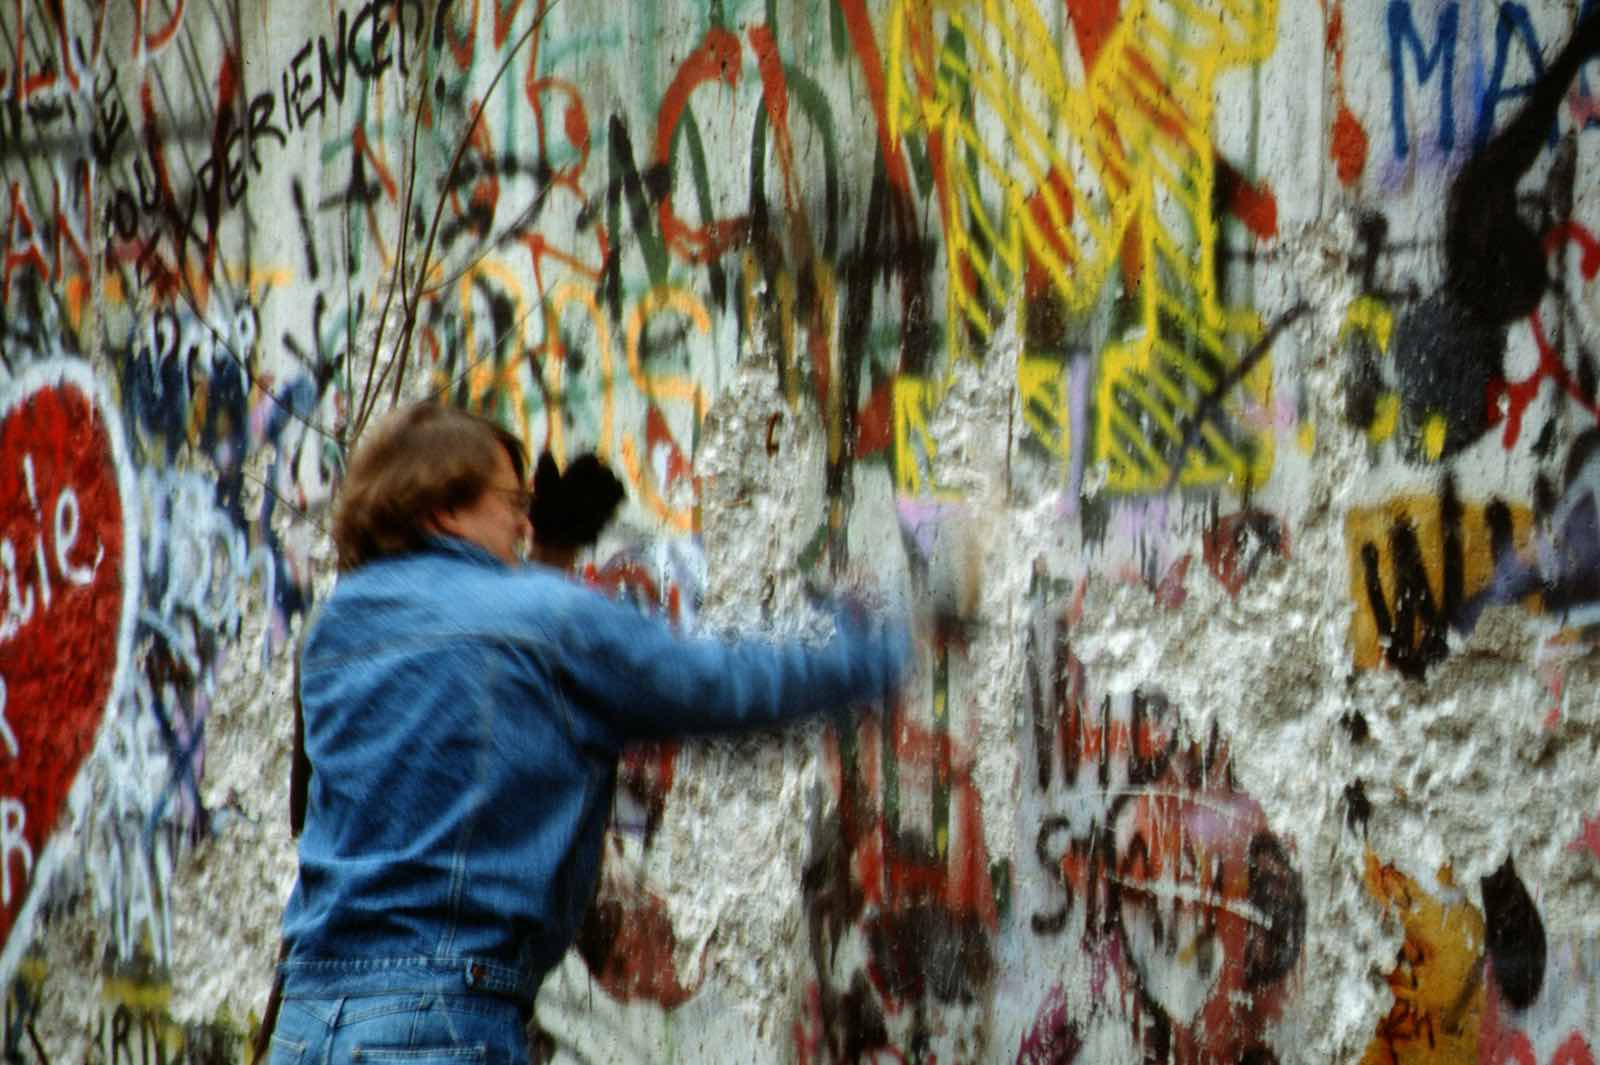 Having a go at the Berlin Wall, November 1989 (Photo: Thiémard horlogerie/Flickr)